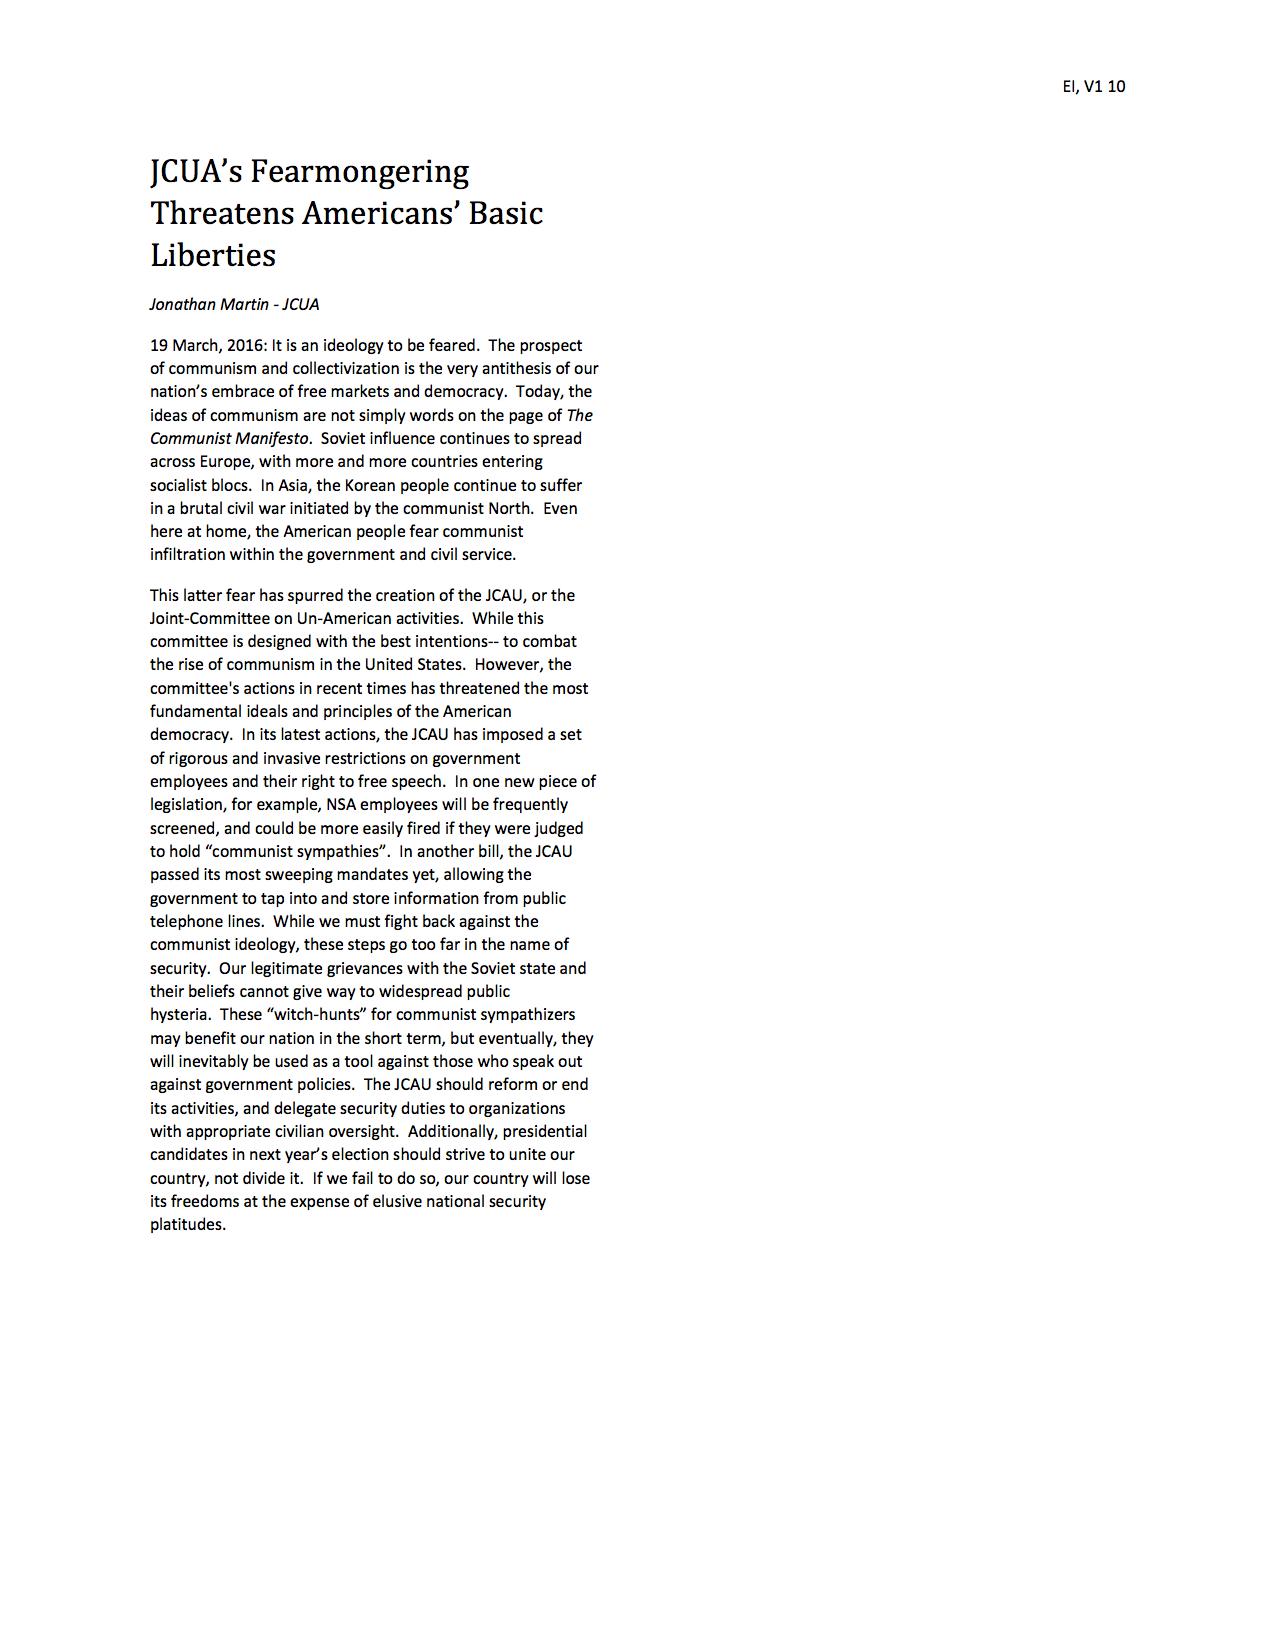 FINALEagle_International_News_(10).jpg